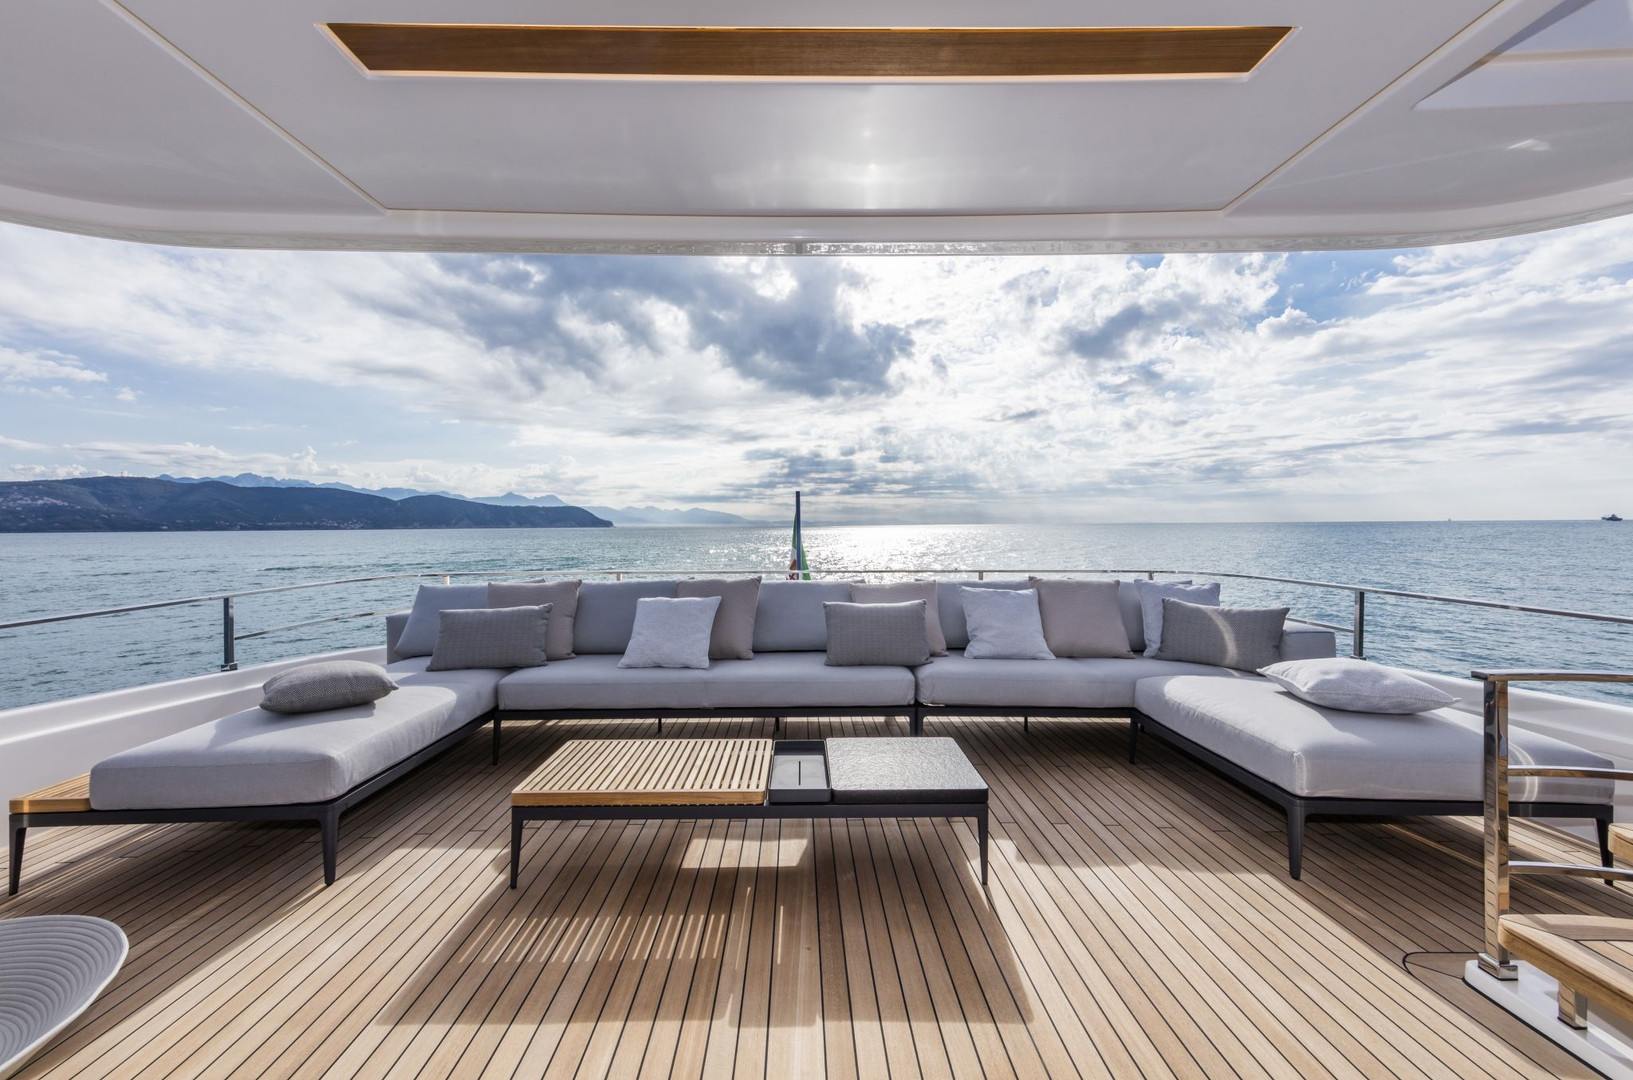 Yacht DECEMBER SIX - Exterior, lounging on bridge deck aft